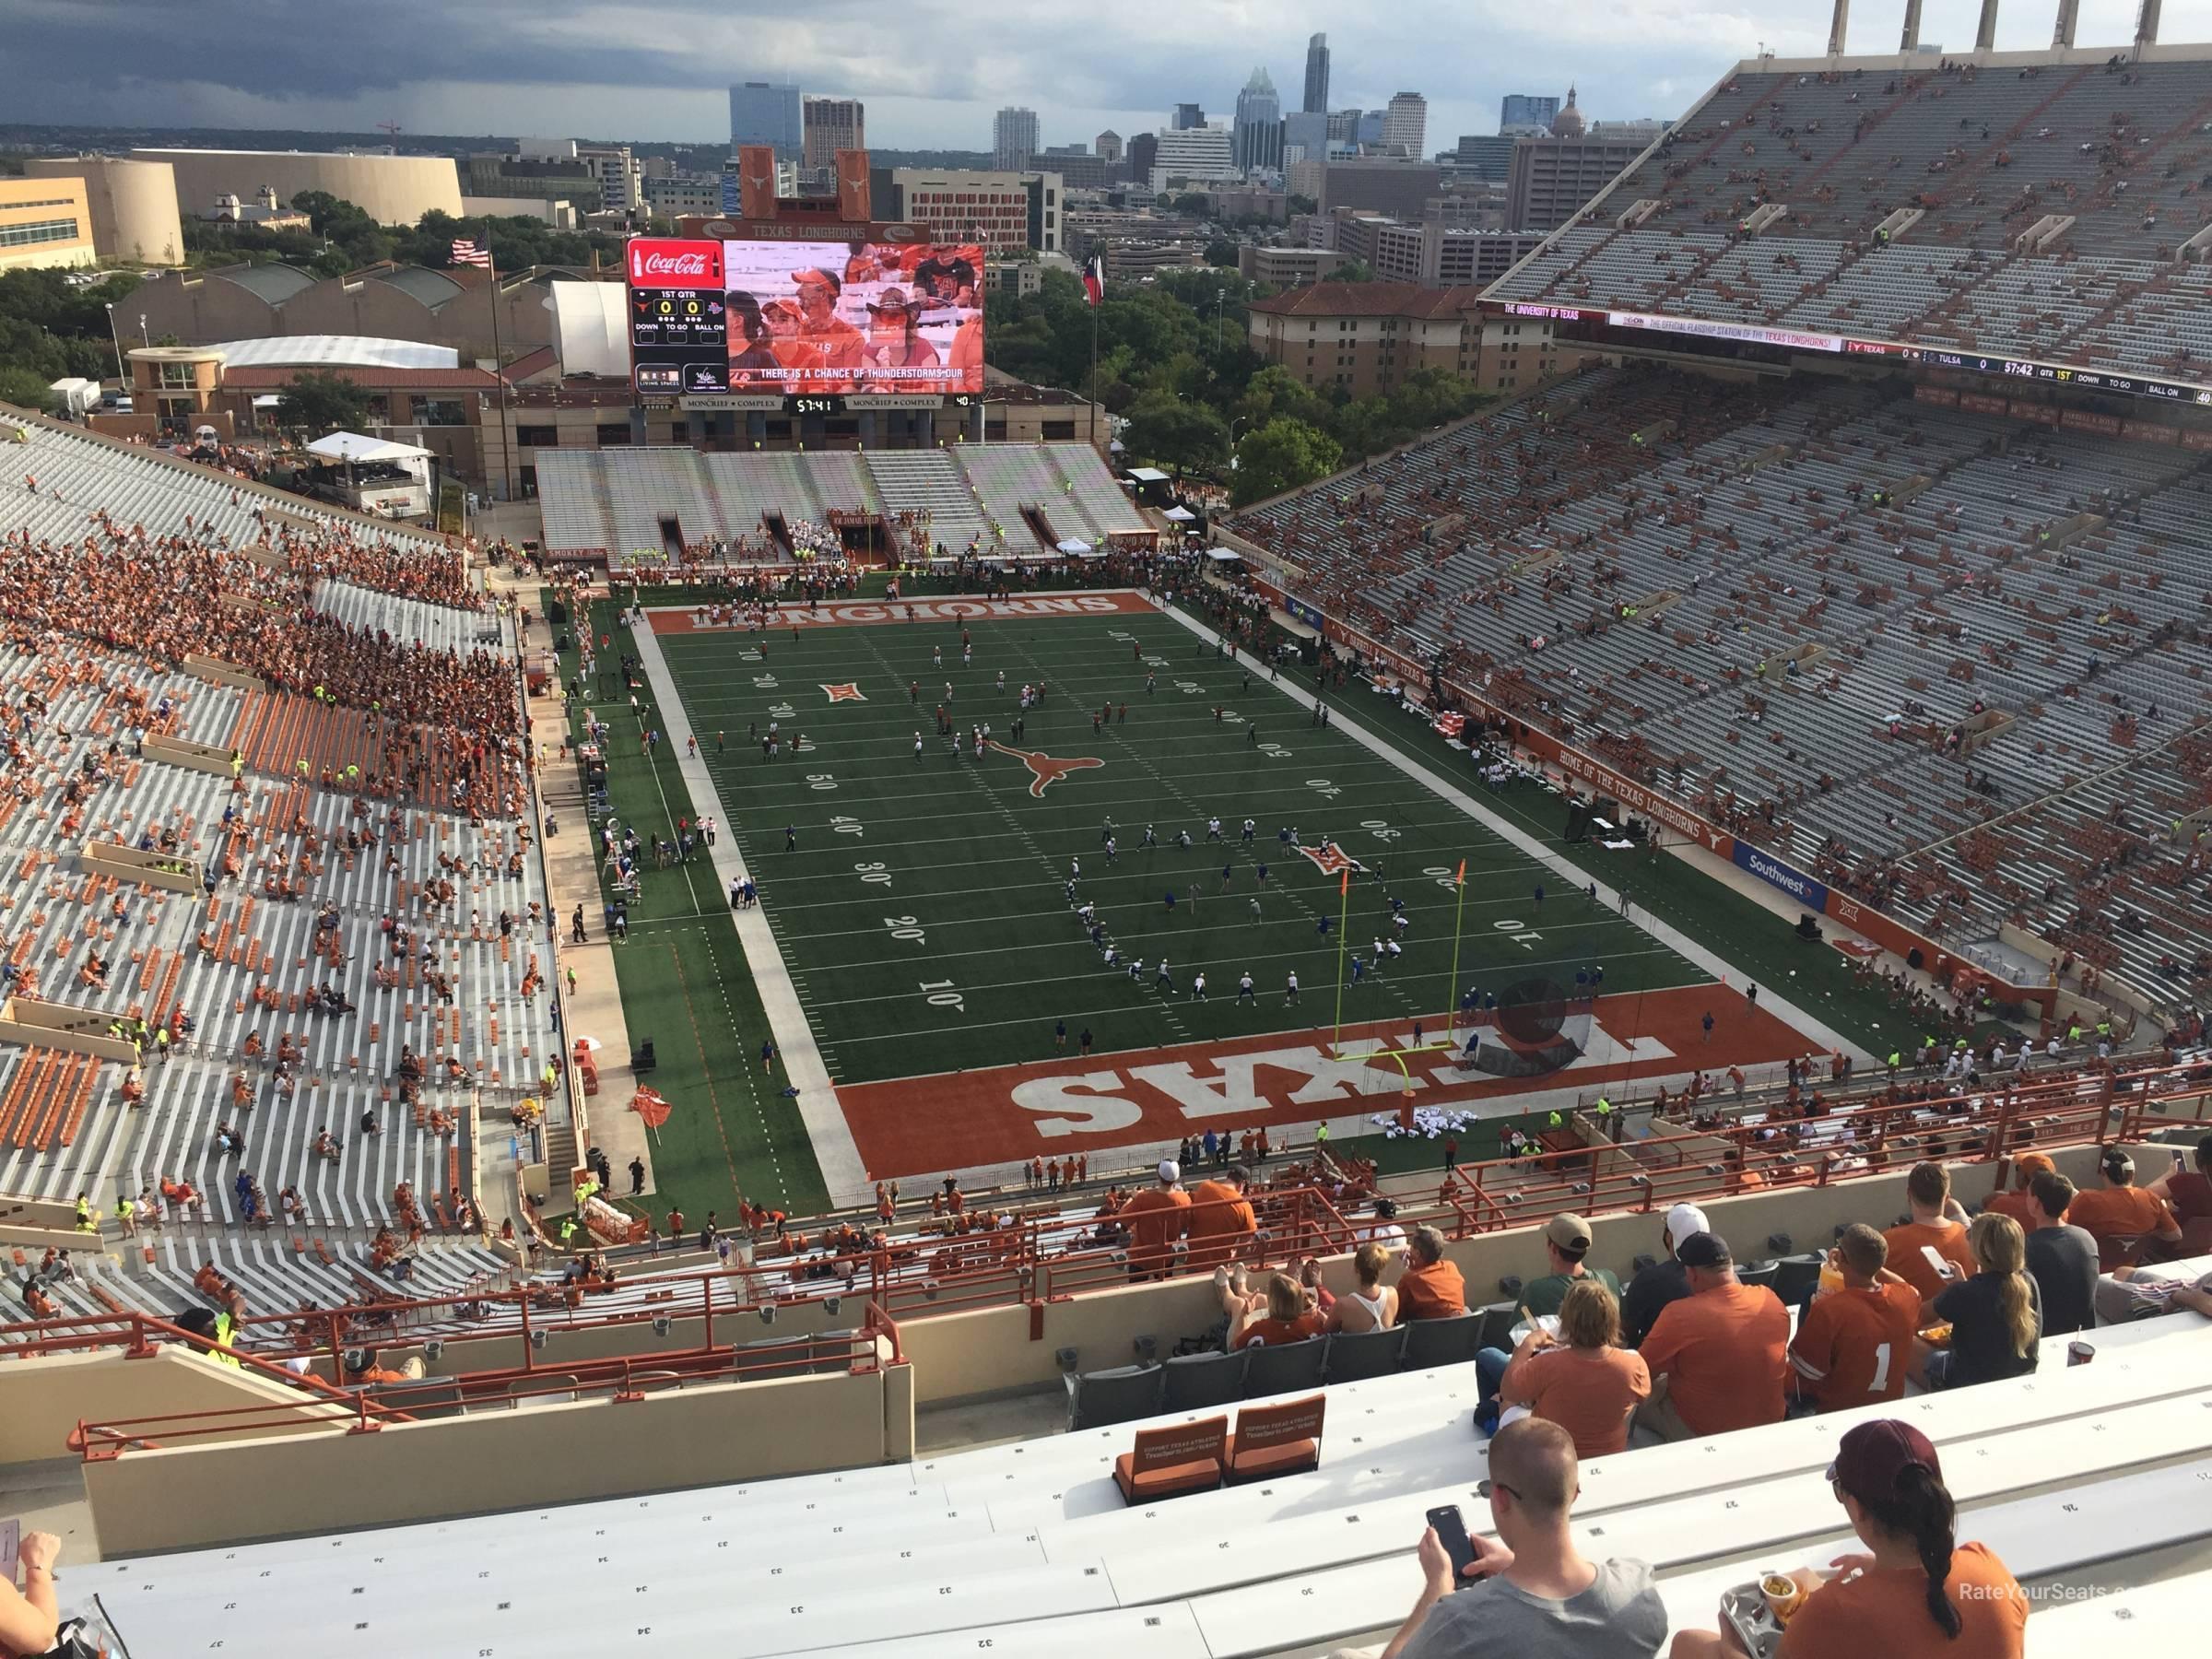 Dkr-Texas Memorial Stadium Section 117 - Rateyourseats - University Of Texas Stadium Seating Map